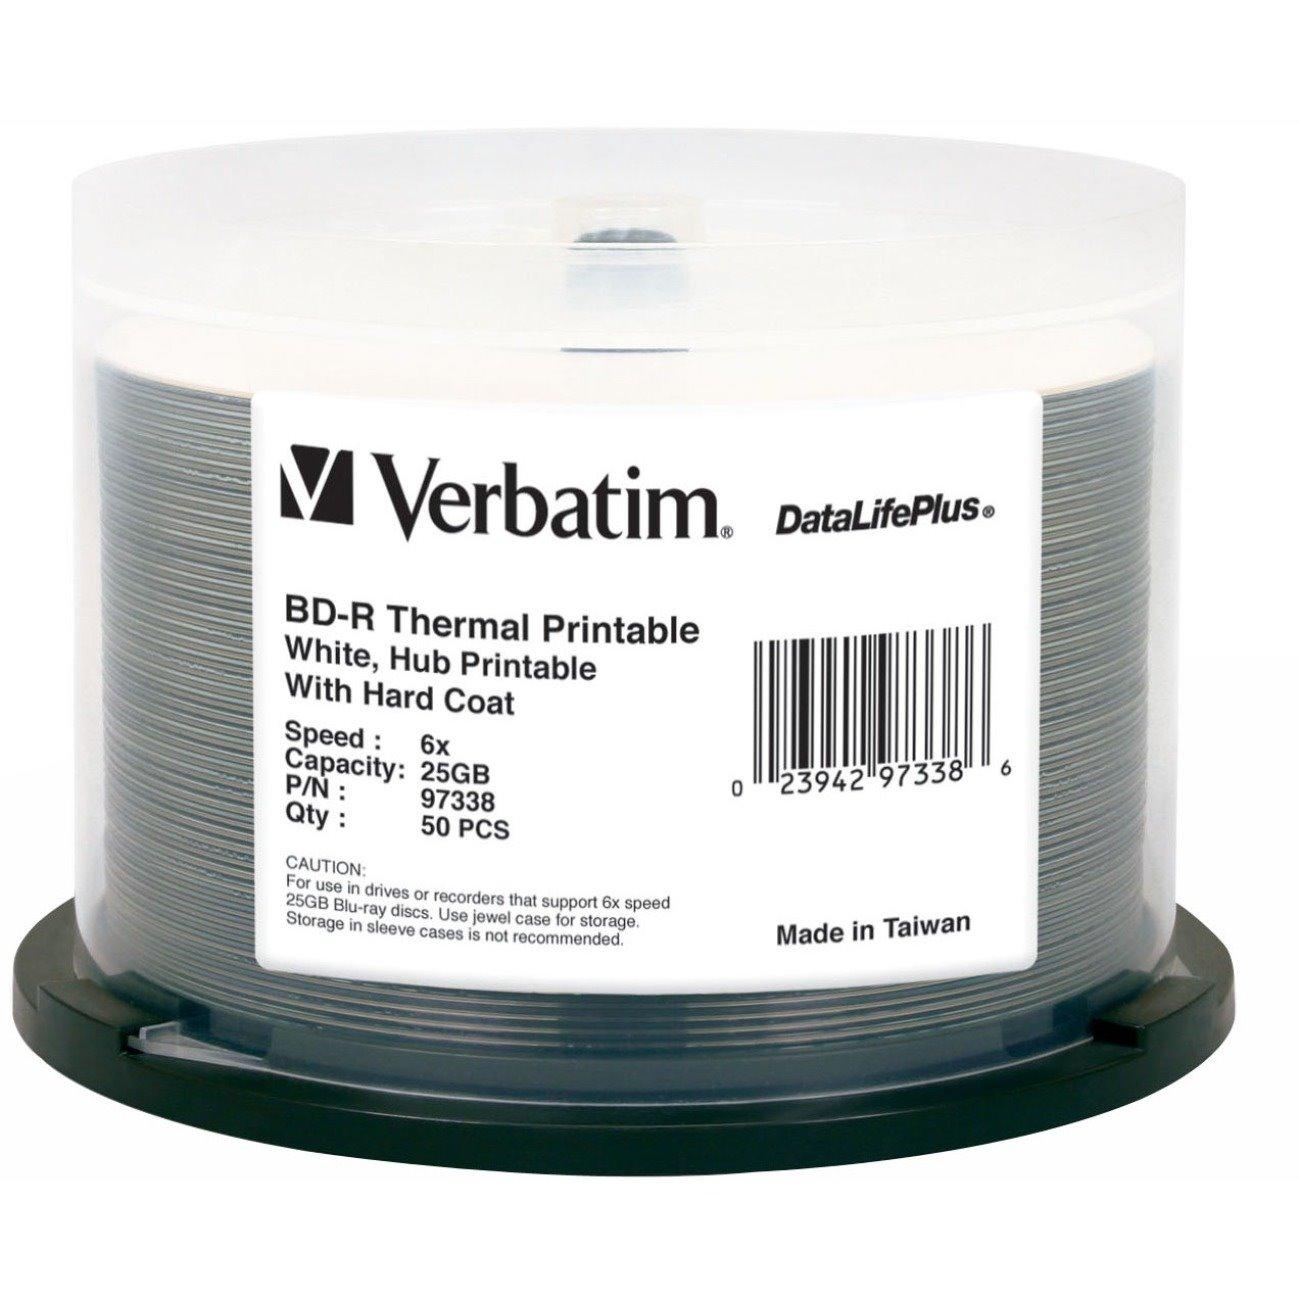 Verbatim DataLifePlus 97338 Blu-ray Recordable Media - BD-R - 16x - 25 GB - 50 Pack Spindle